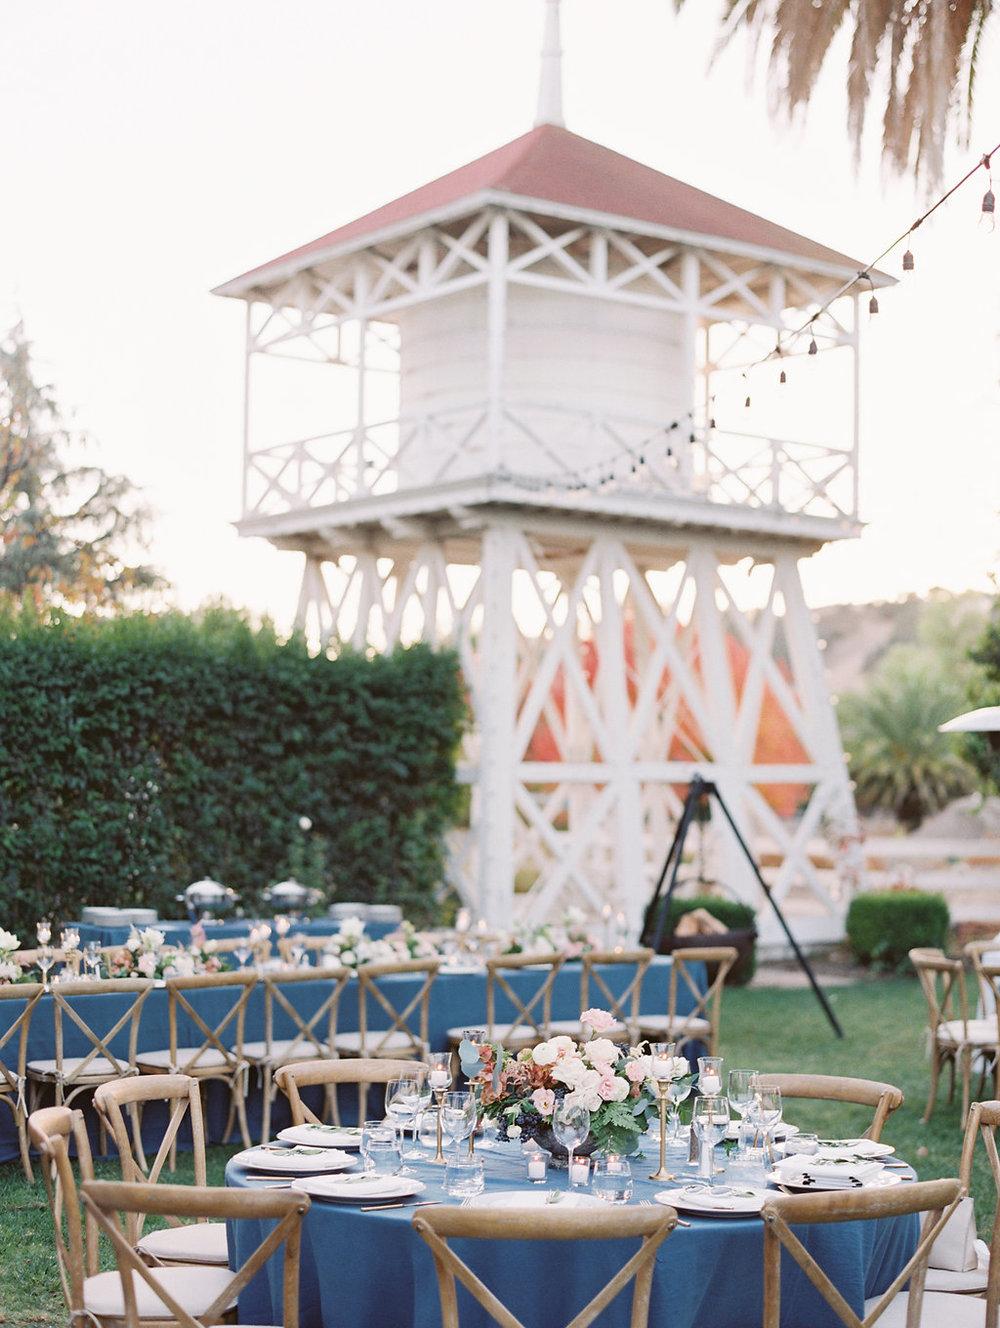 www.santabarbarawedding.com | Soleil Events | Mattei's Tavern | Reception Tables